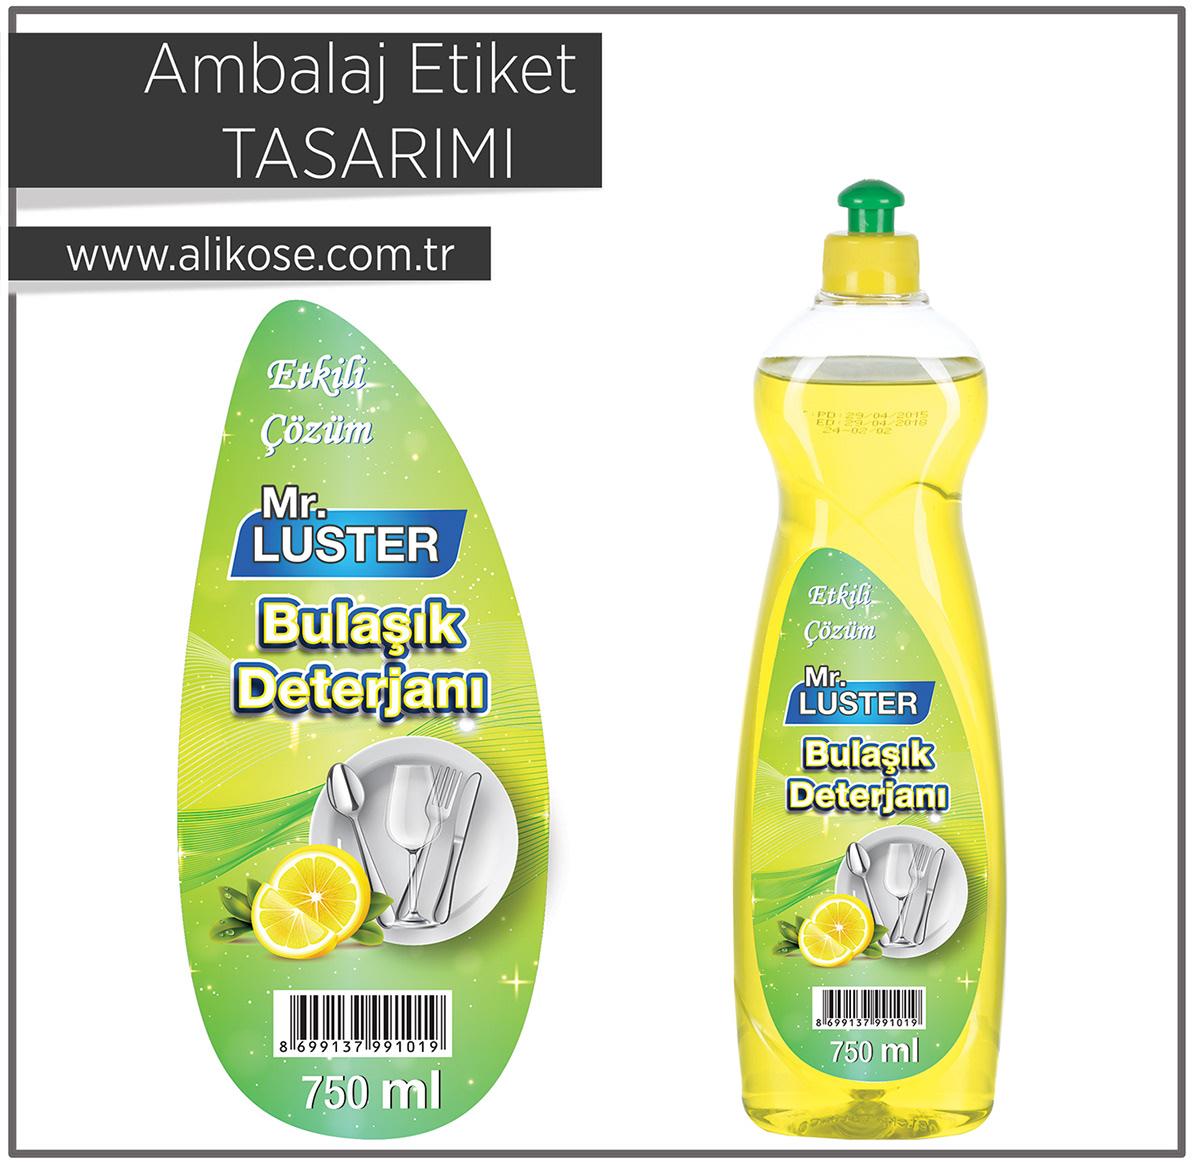 packaging design design Packaging grapich Aliköse CGKOSE dishwashing detergent